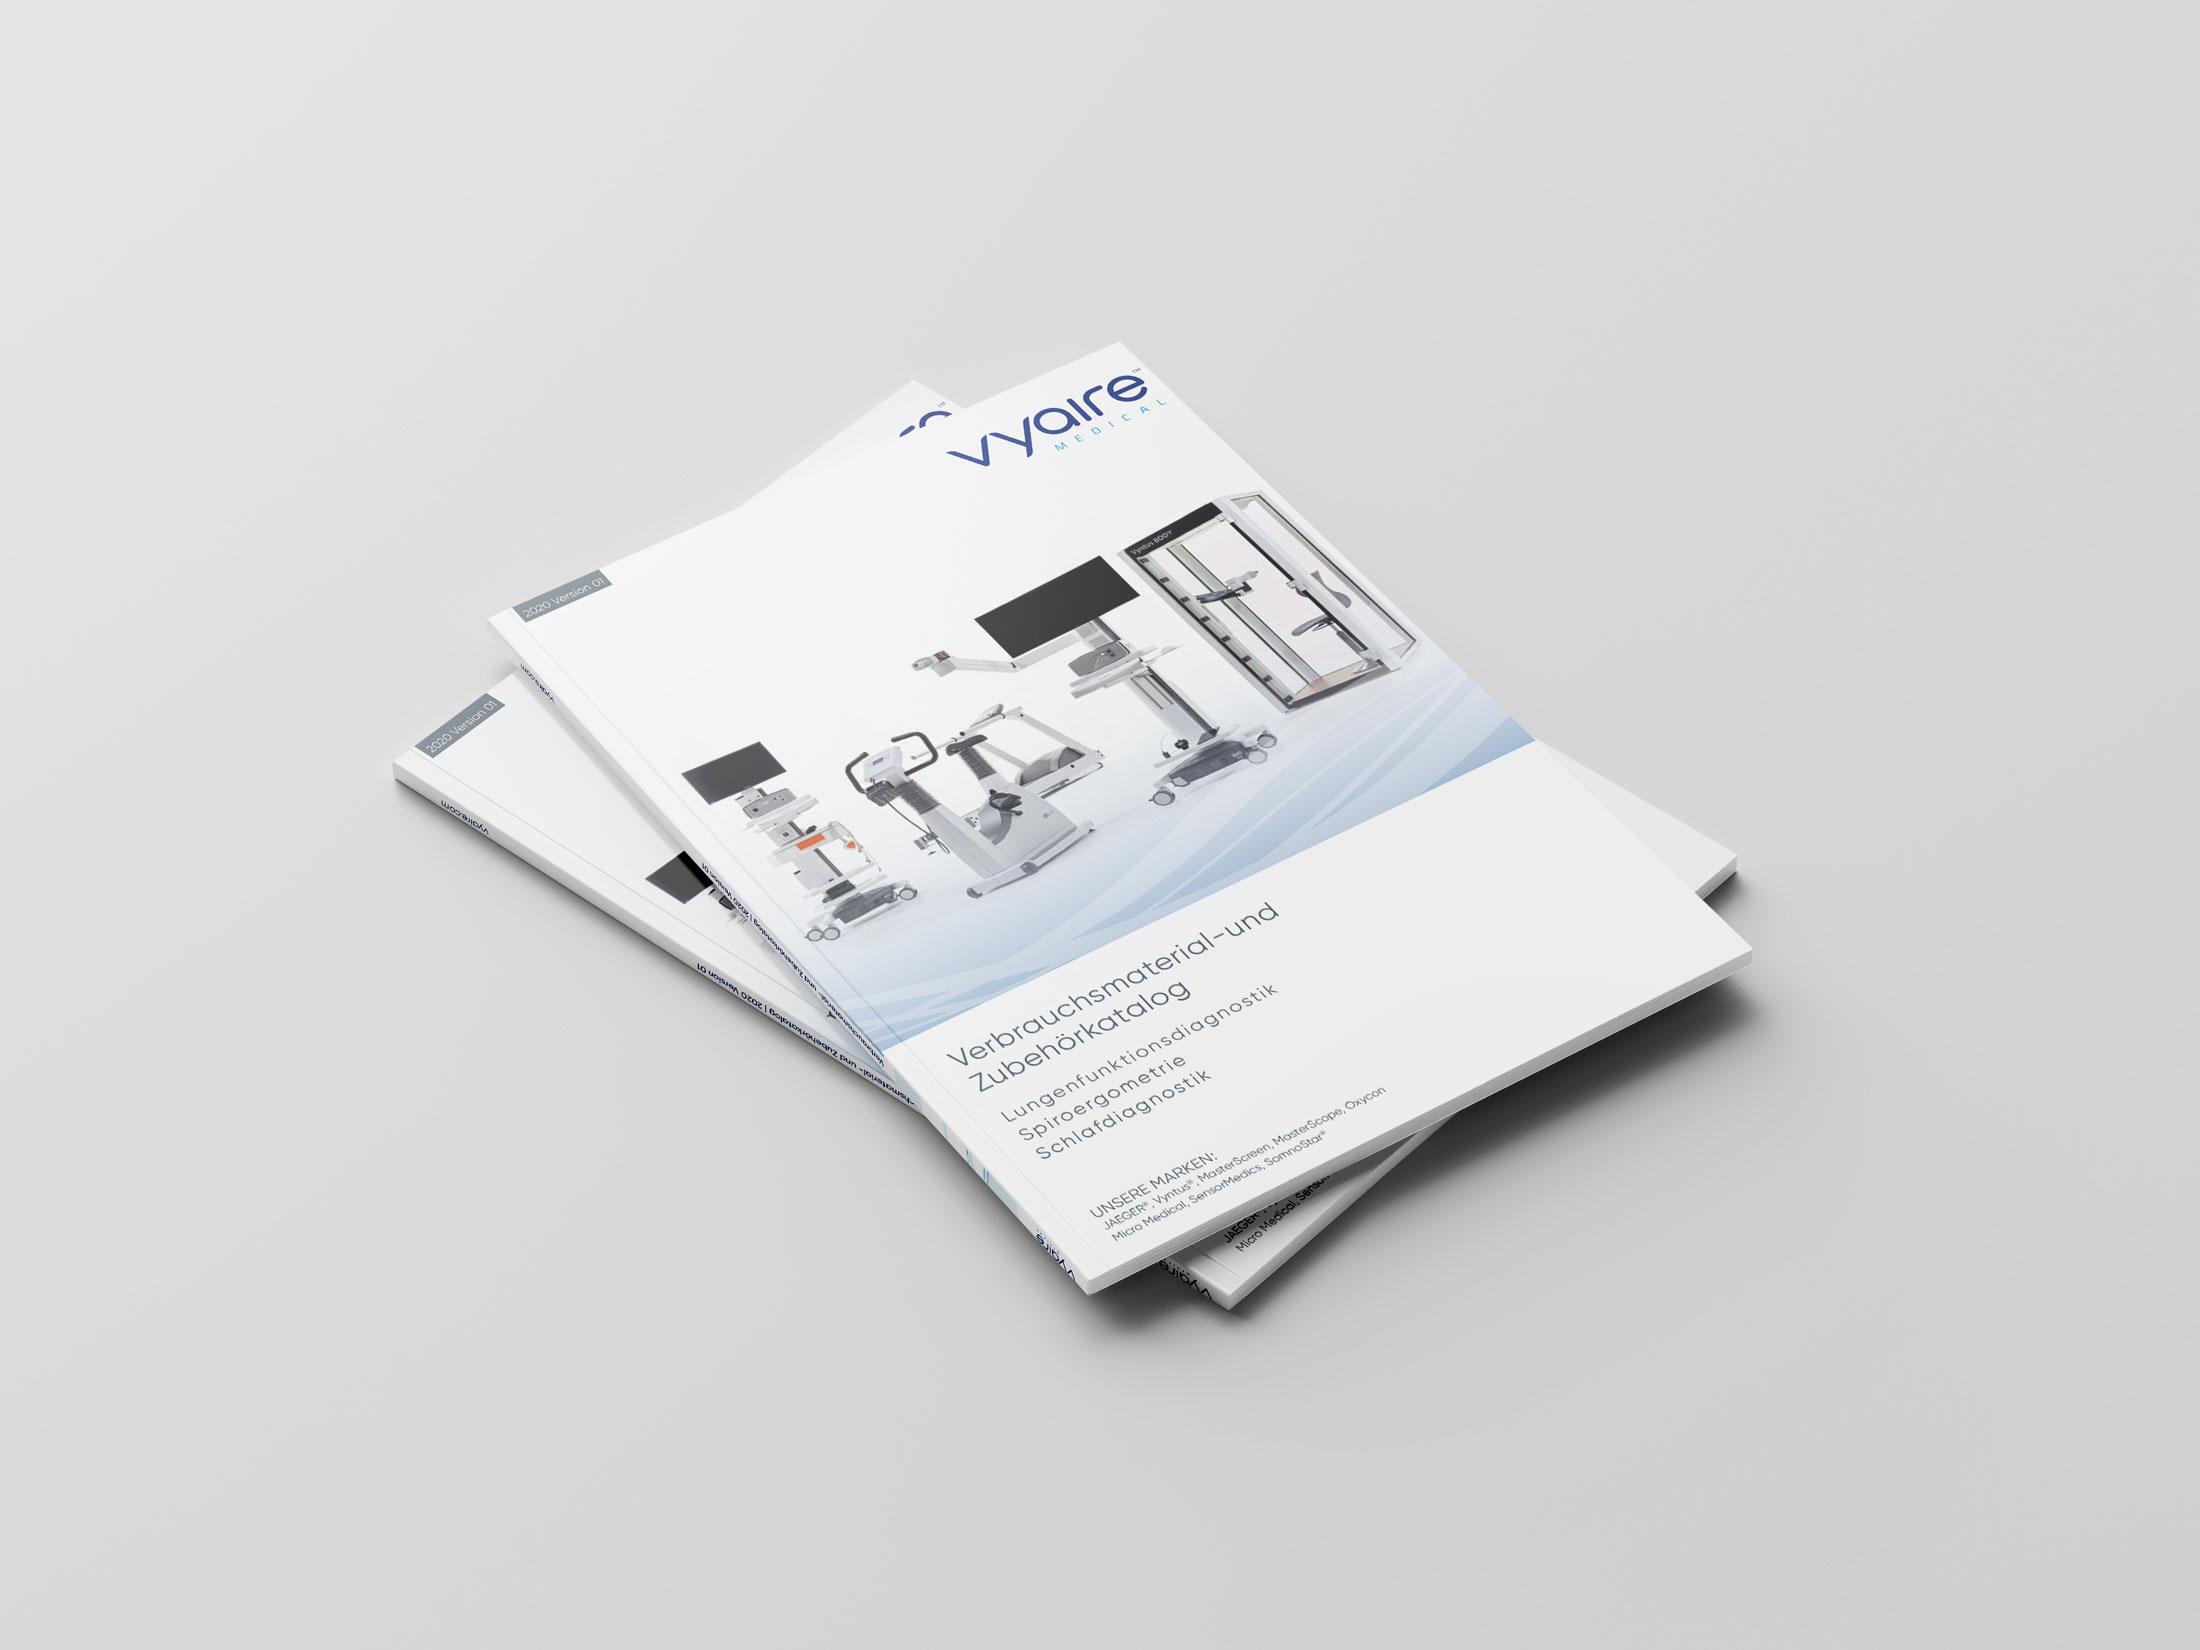 Katalog Automatisierung